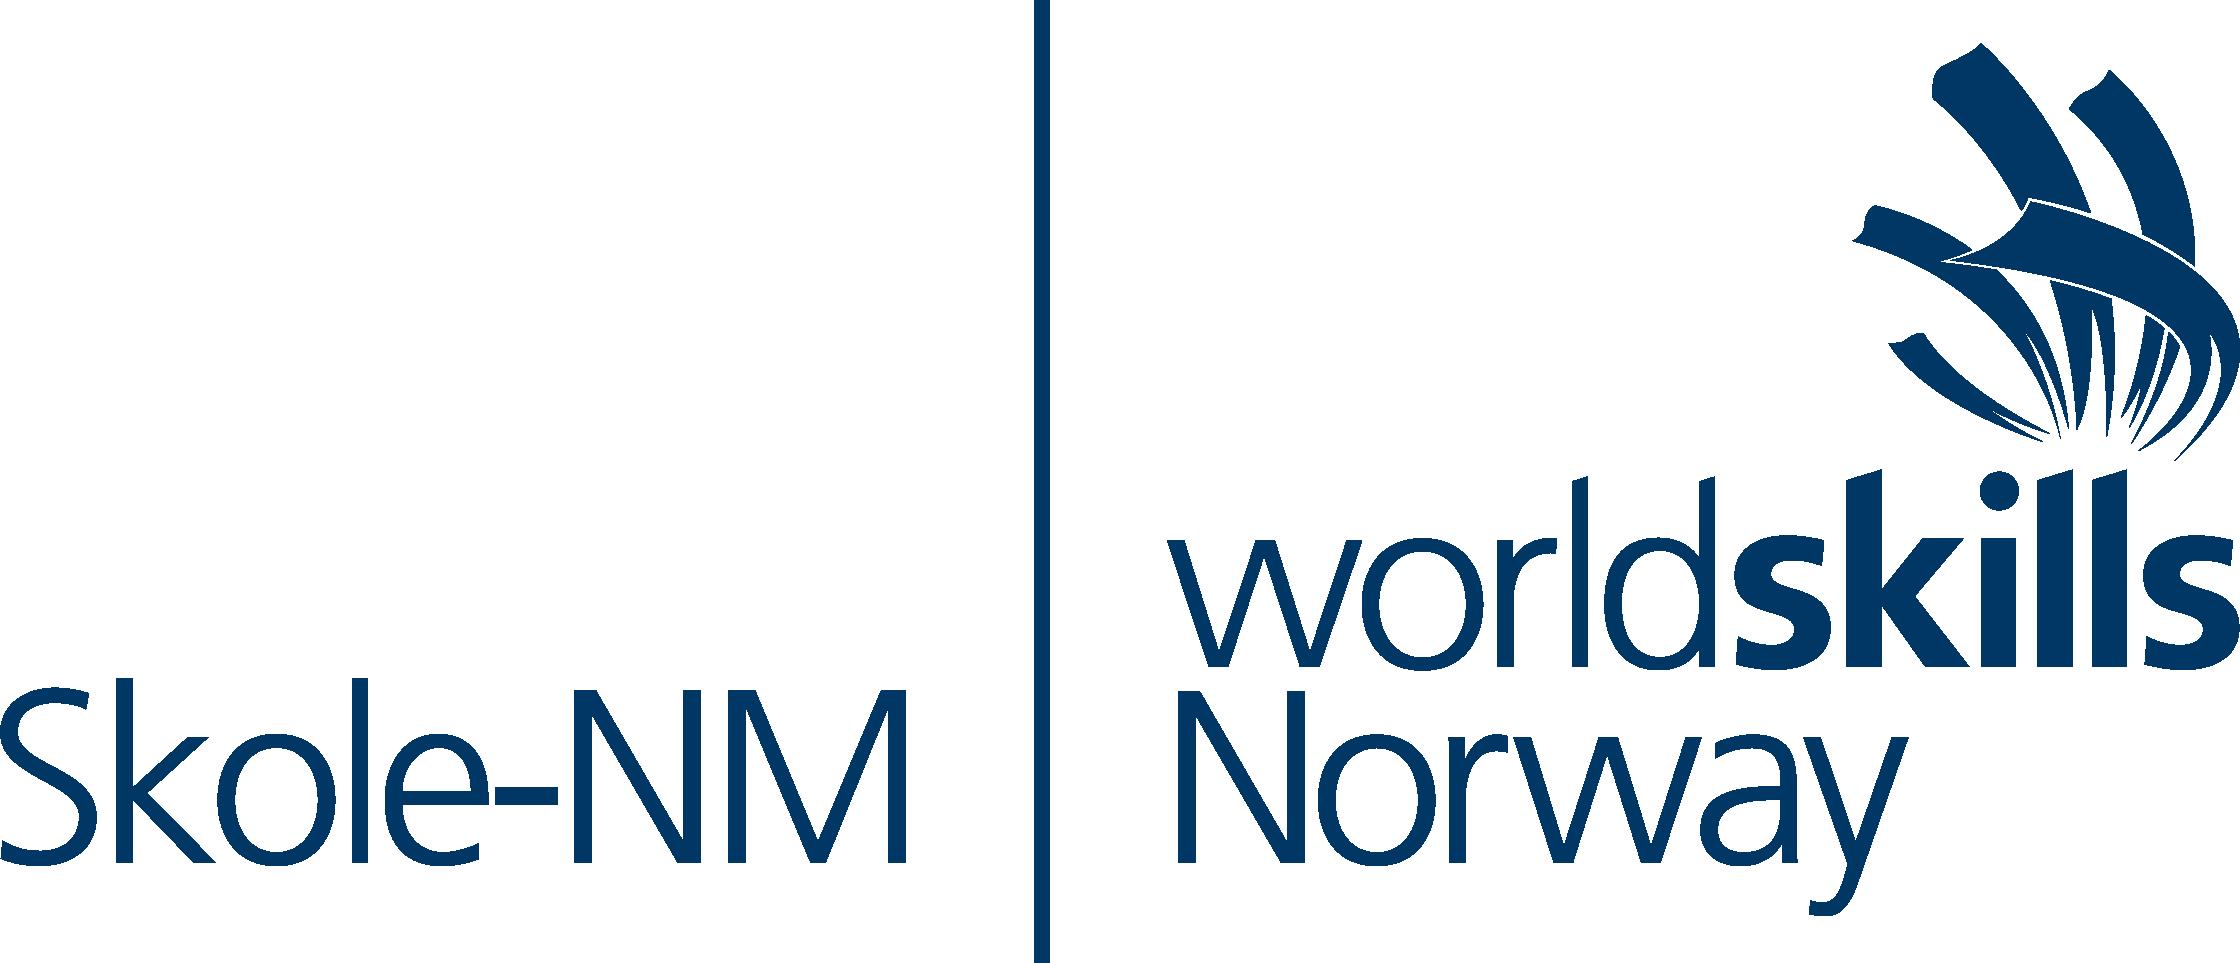 skole-nm_logo_horisontal_darkblue_rgb